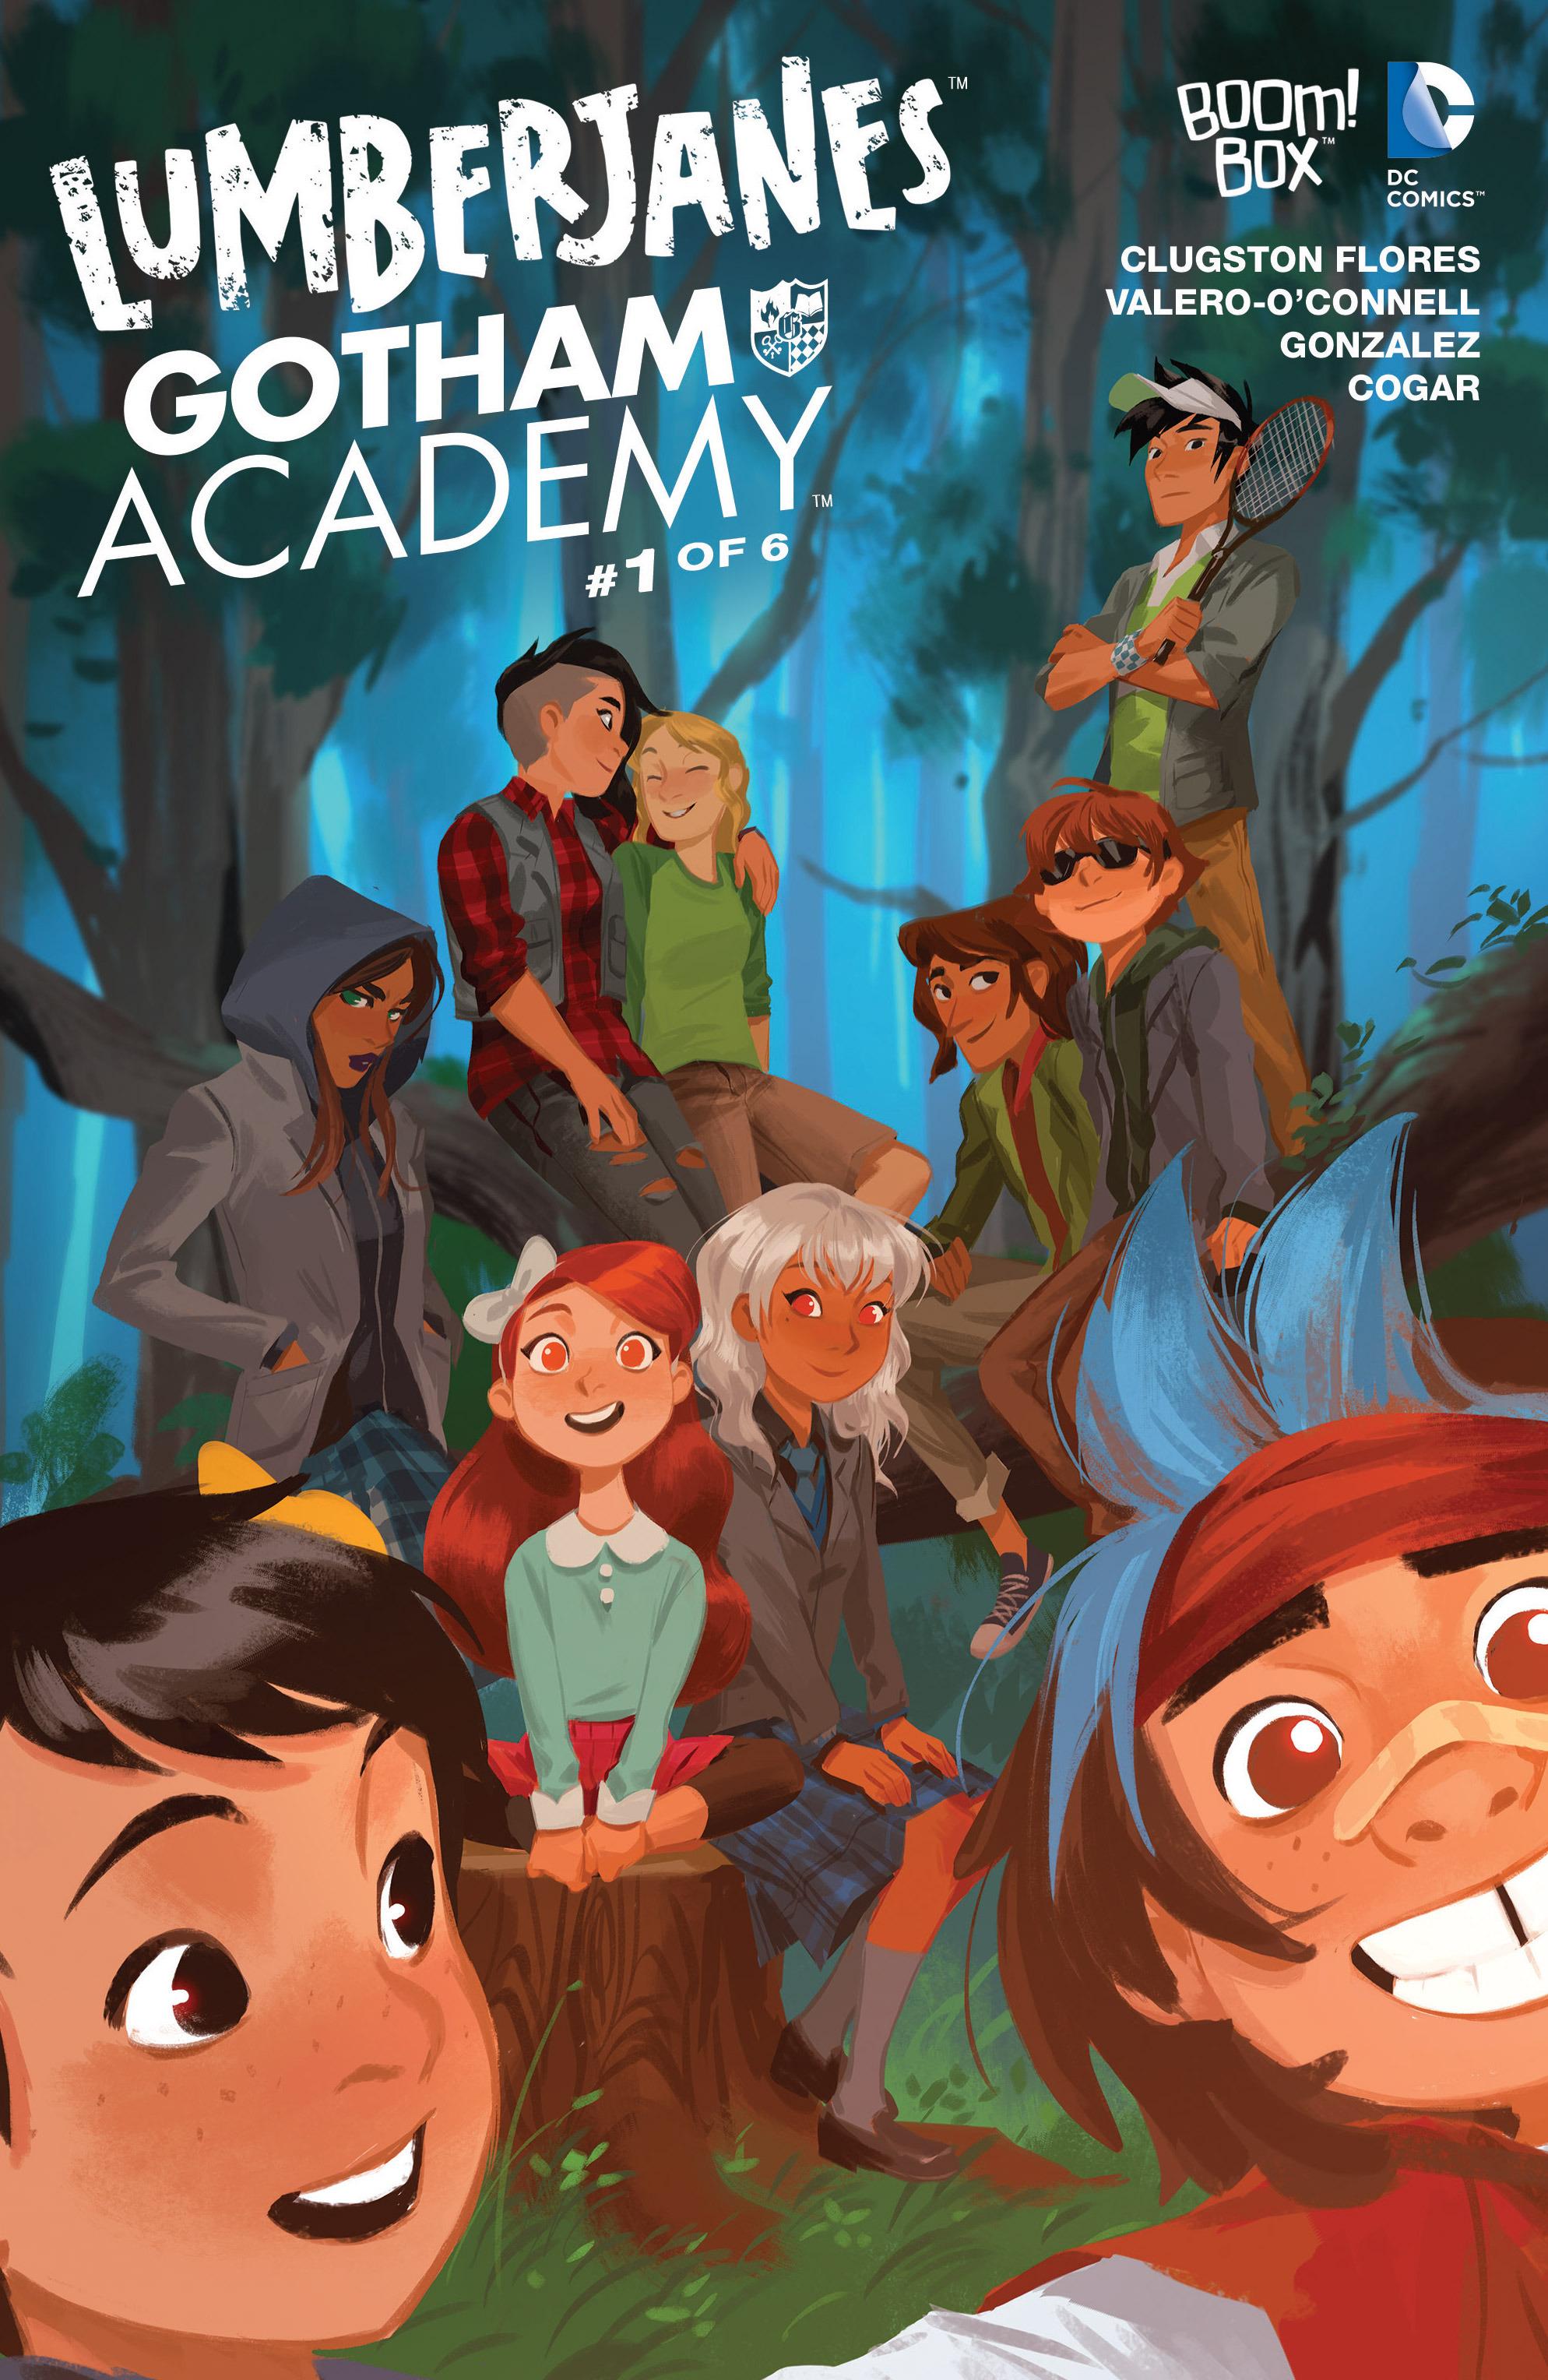 Lumberjanes/Gotham Academy Vol 1